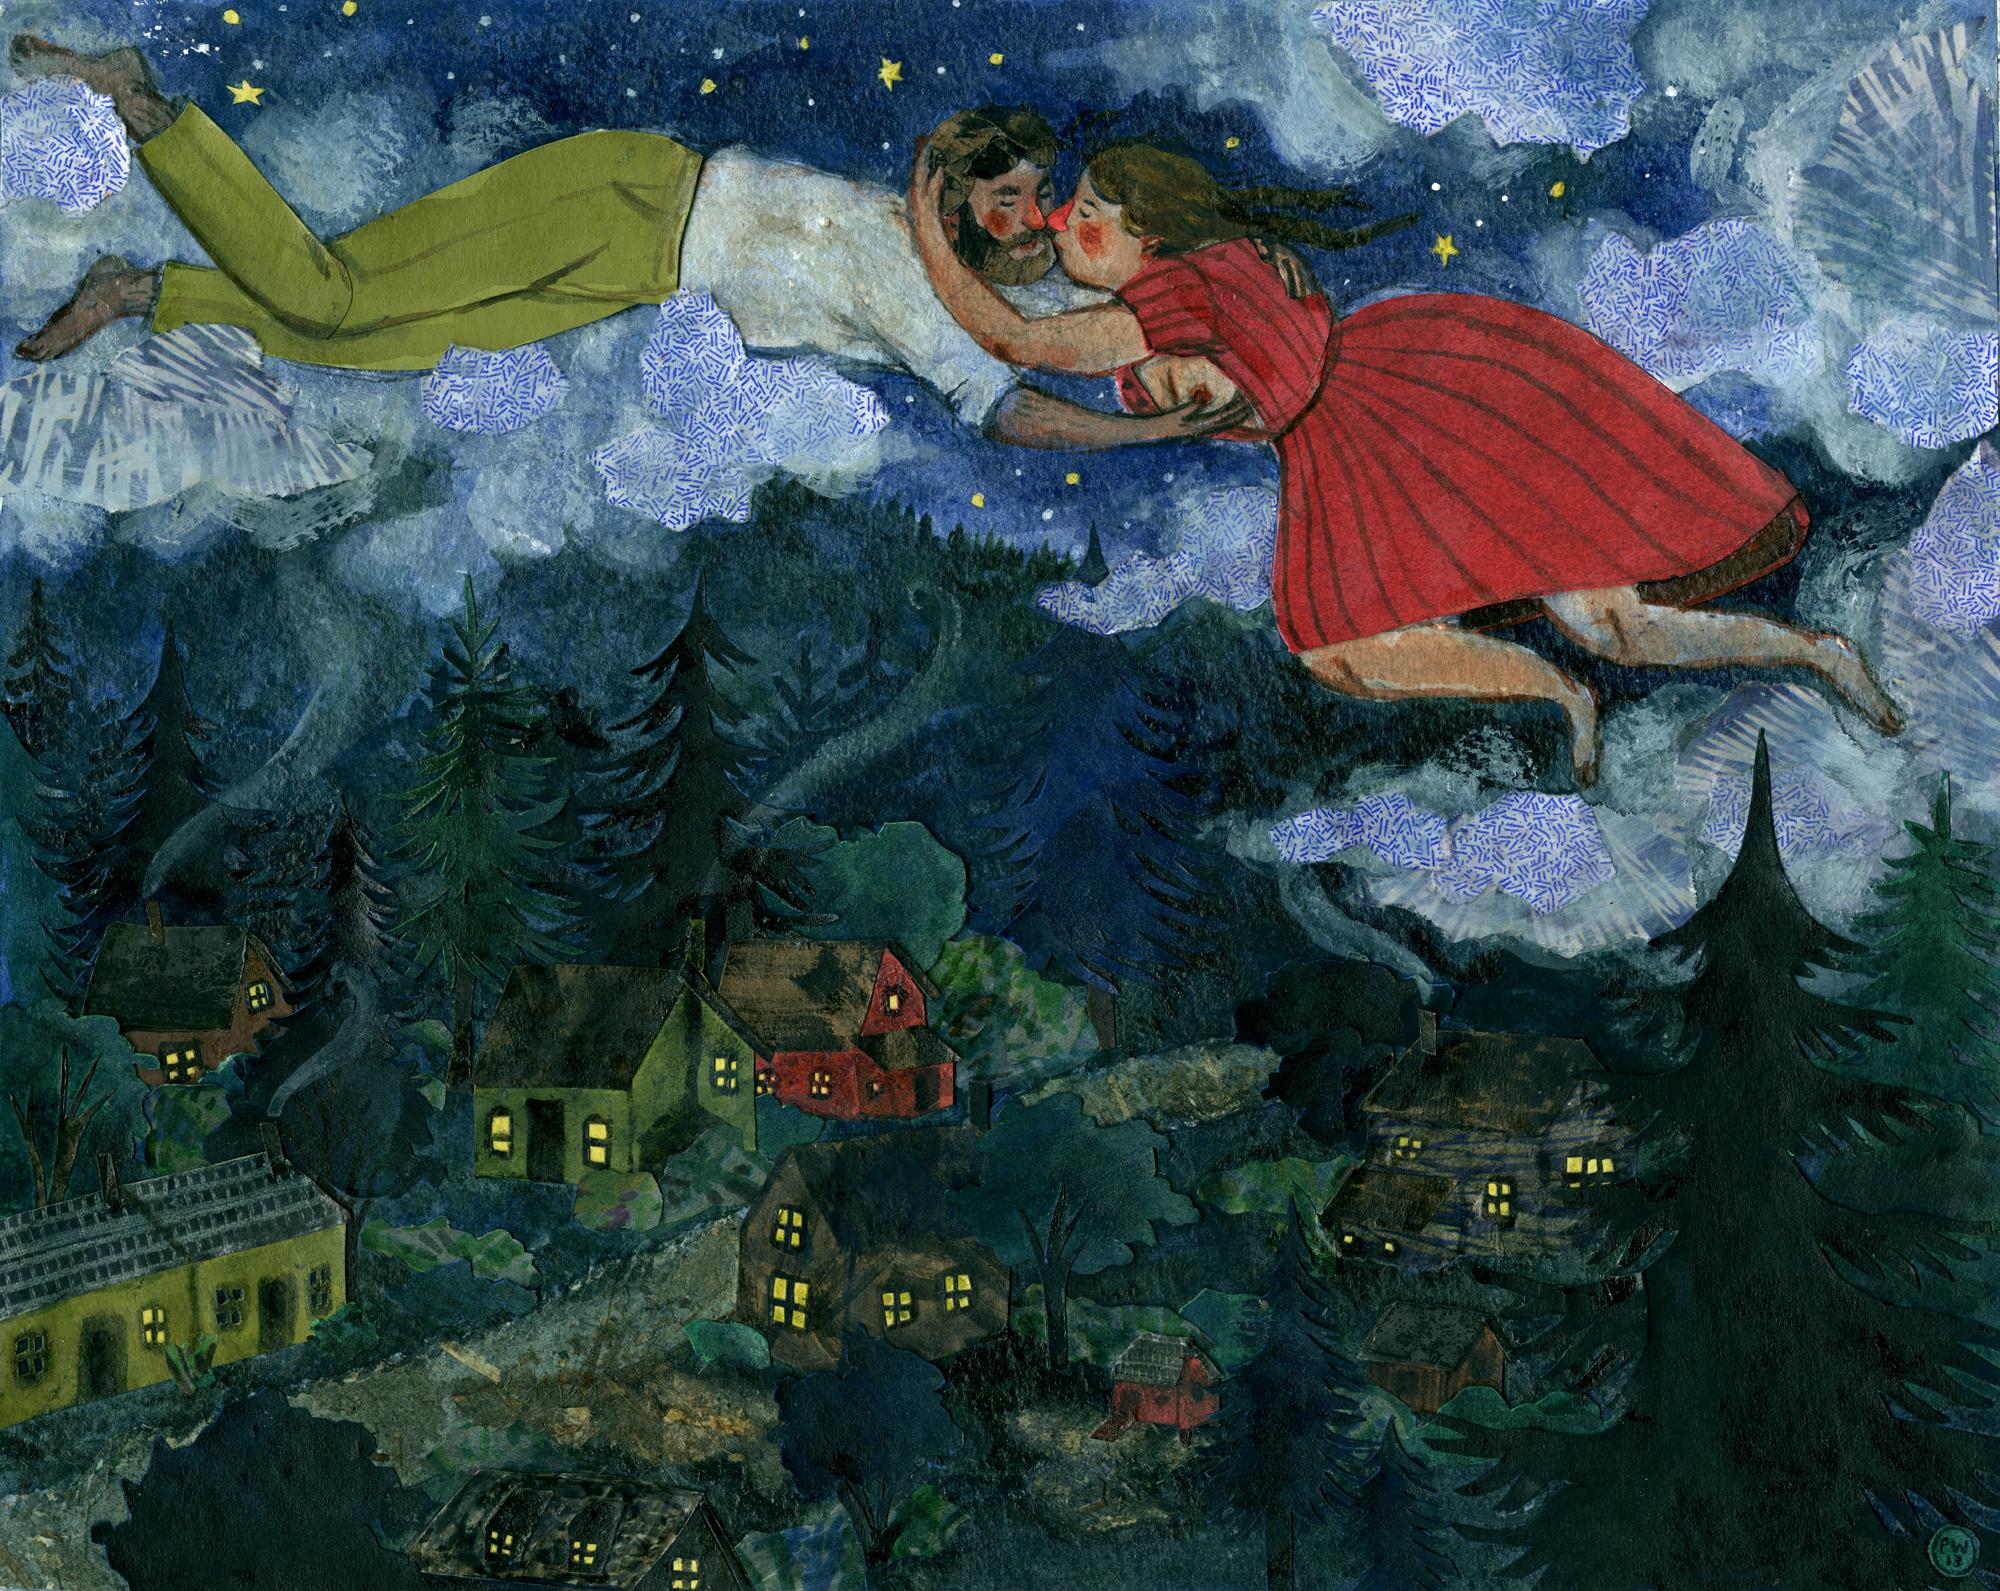 Night Lullaby